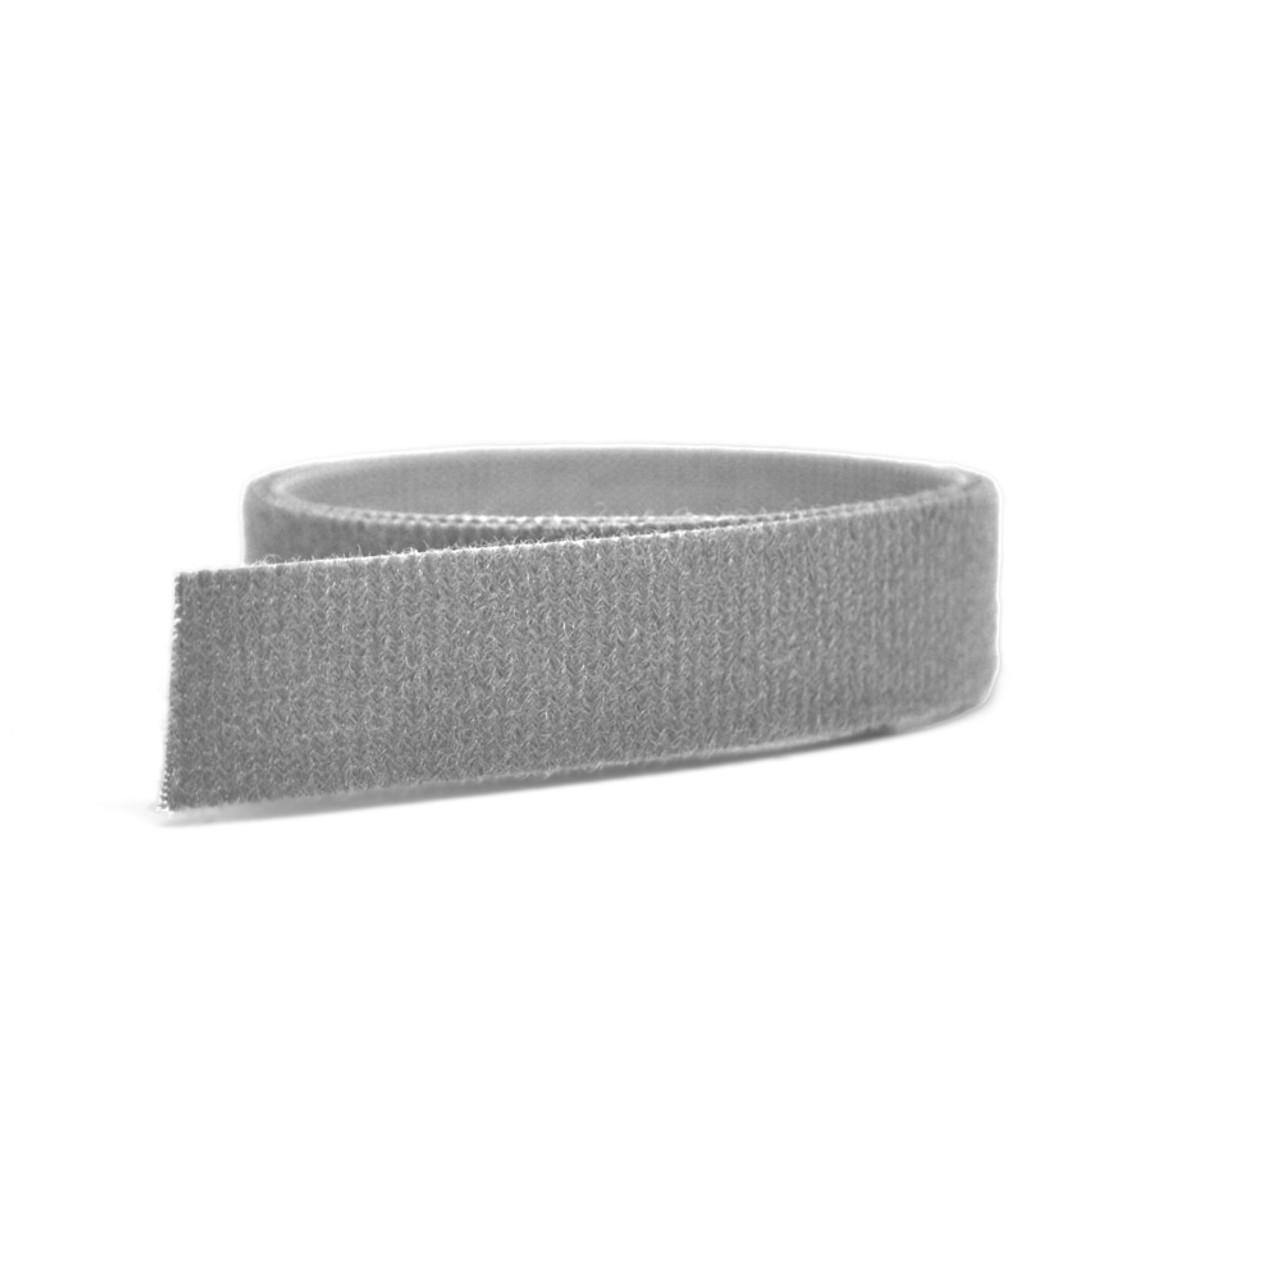 VELCRO® ONE-WRAP® Tape - Gray / Velcro Straps - Bundling Straps - Velcro Tie - Velcro Strap